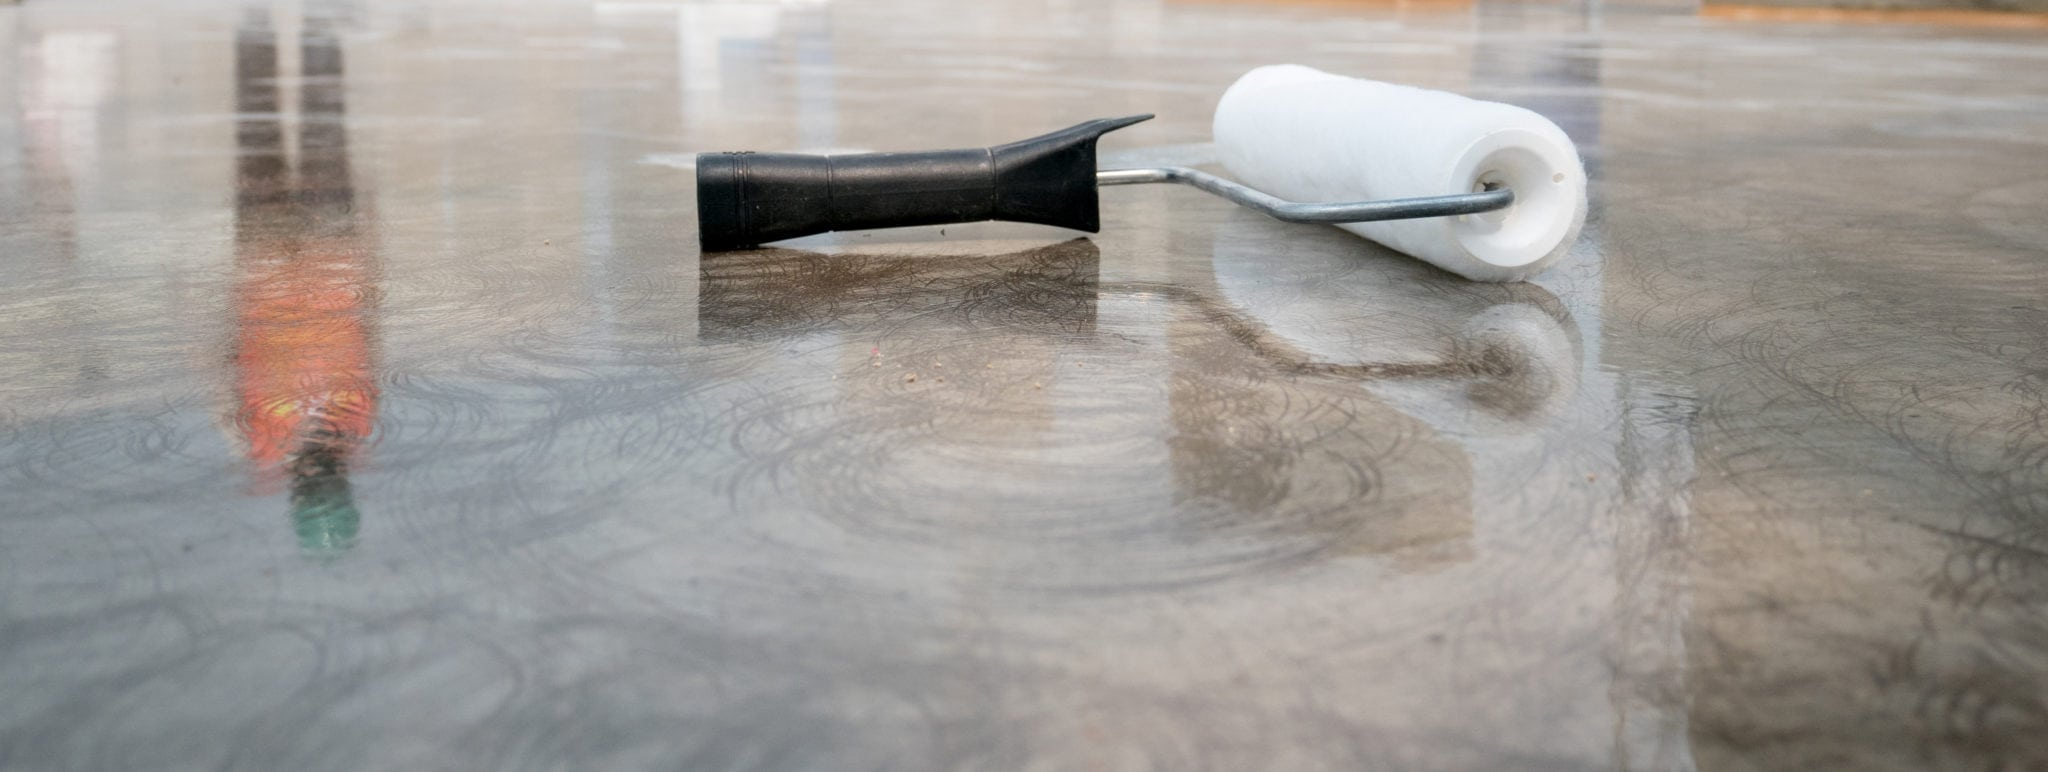 What Do You Use To Seal Concrete Concrete Sealer Reviews